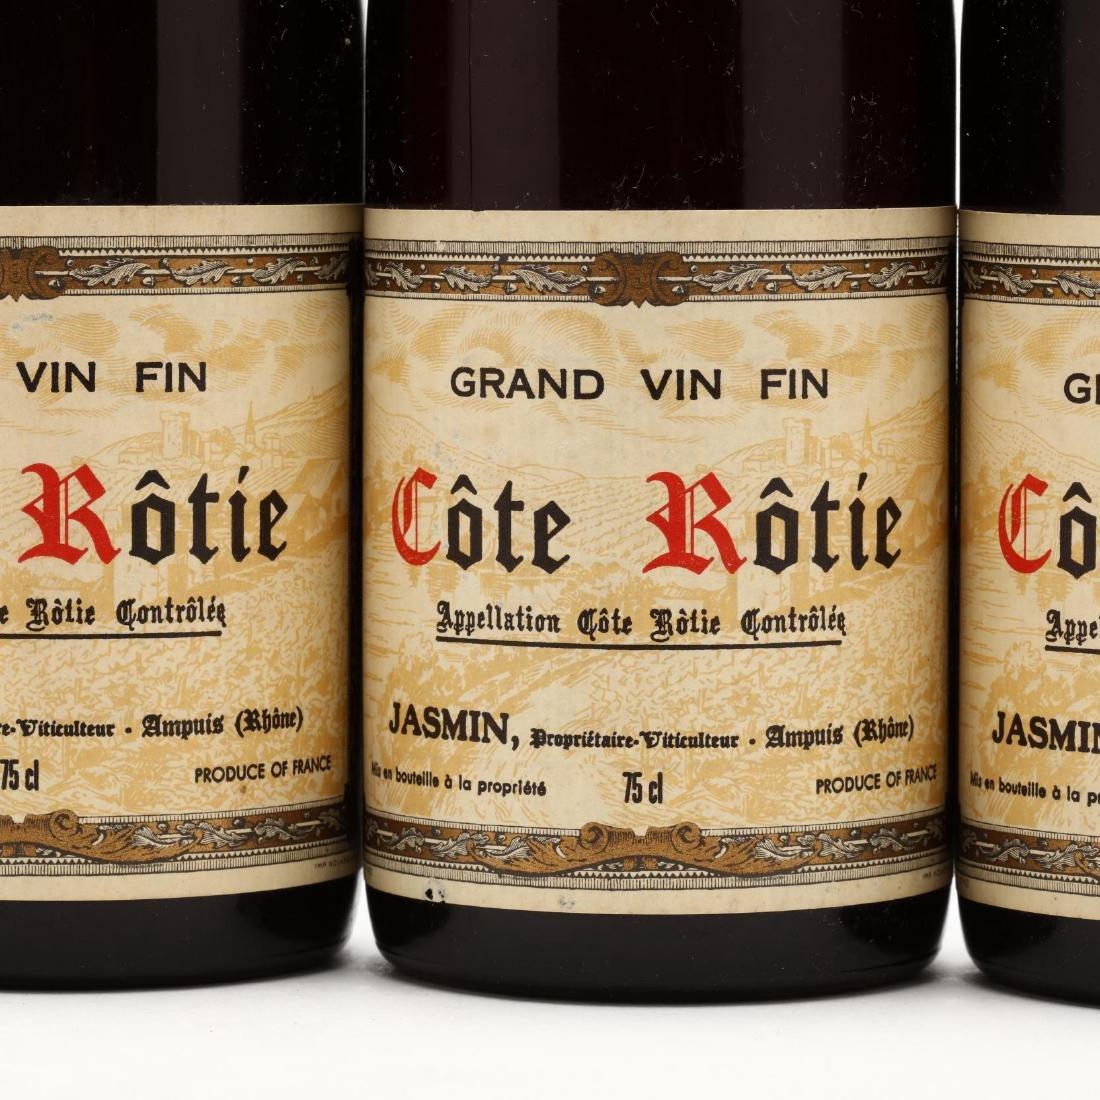 Cote Rotie - Vintage 1985 - 2